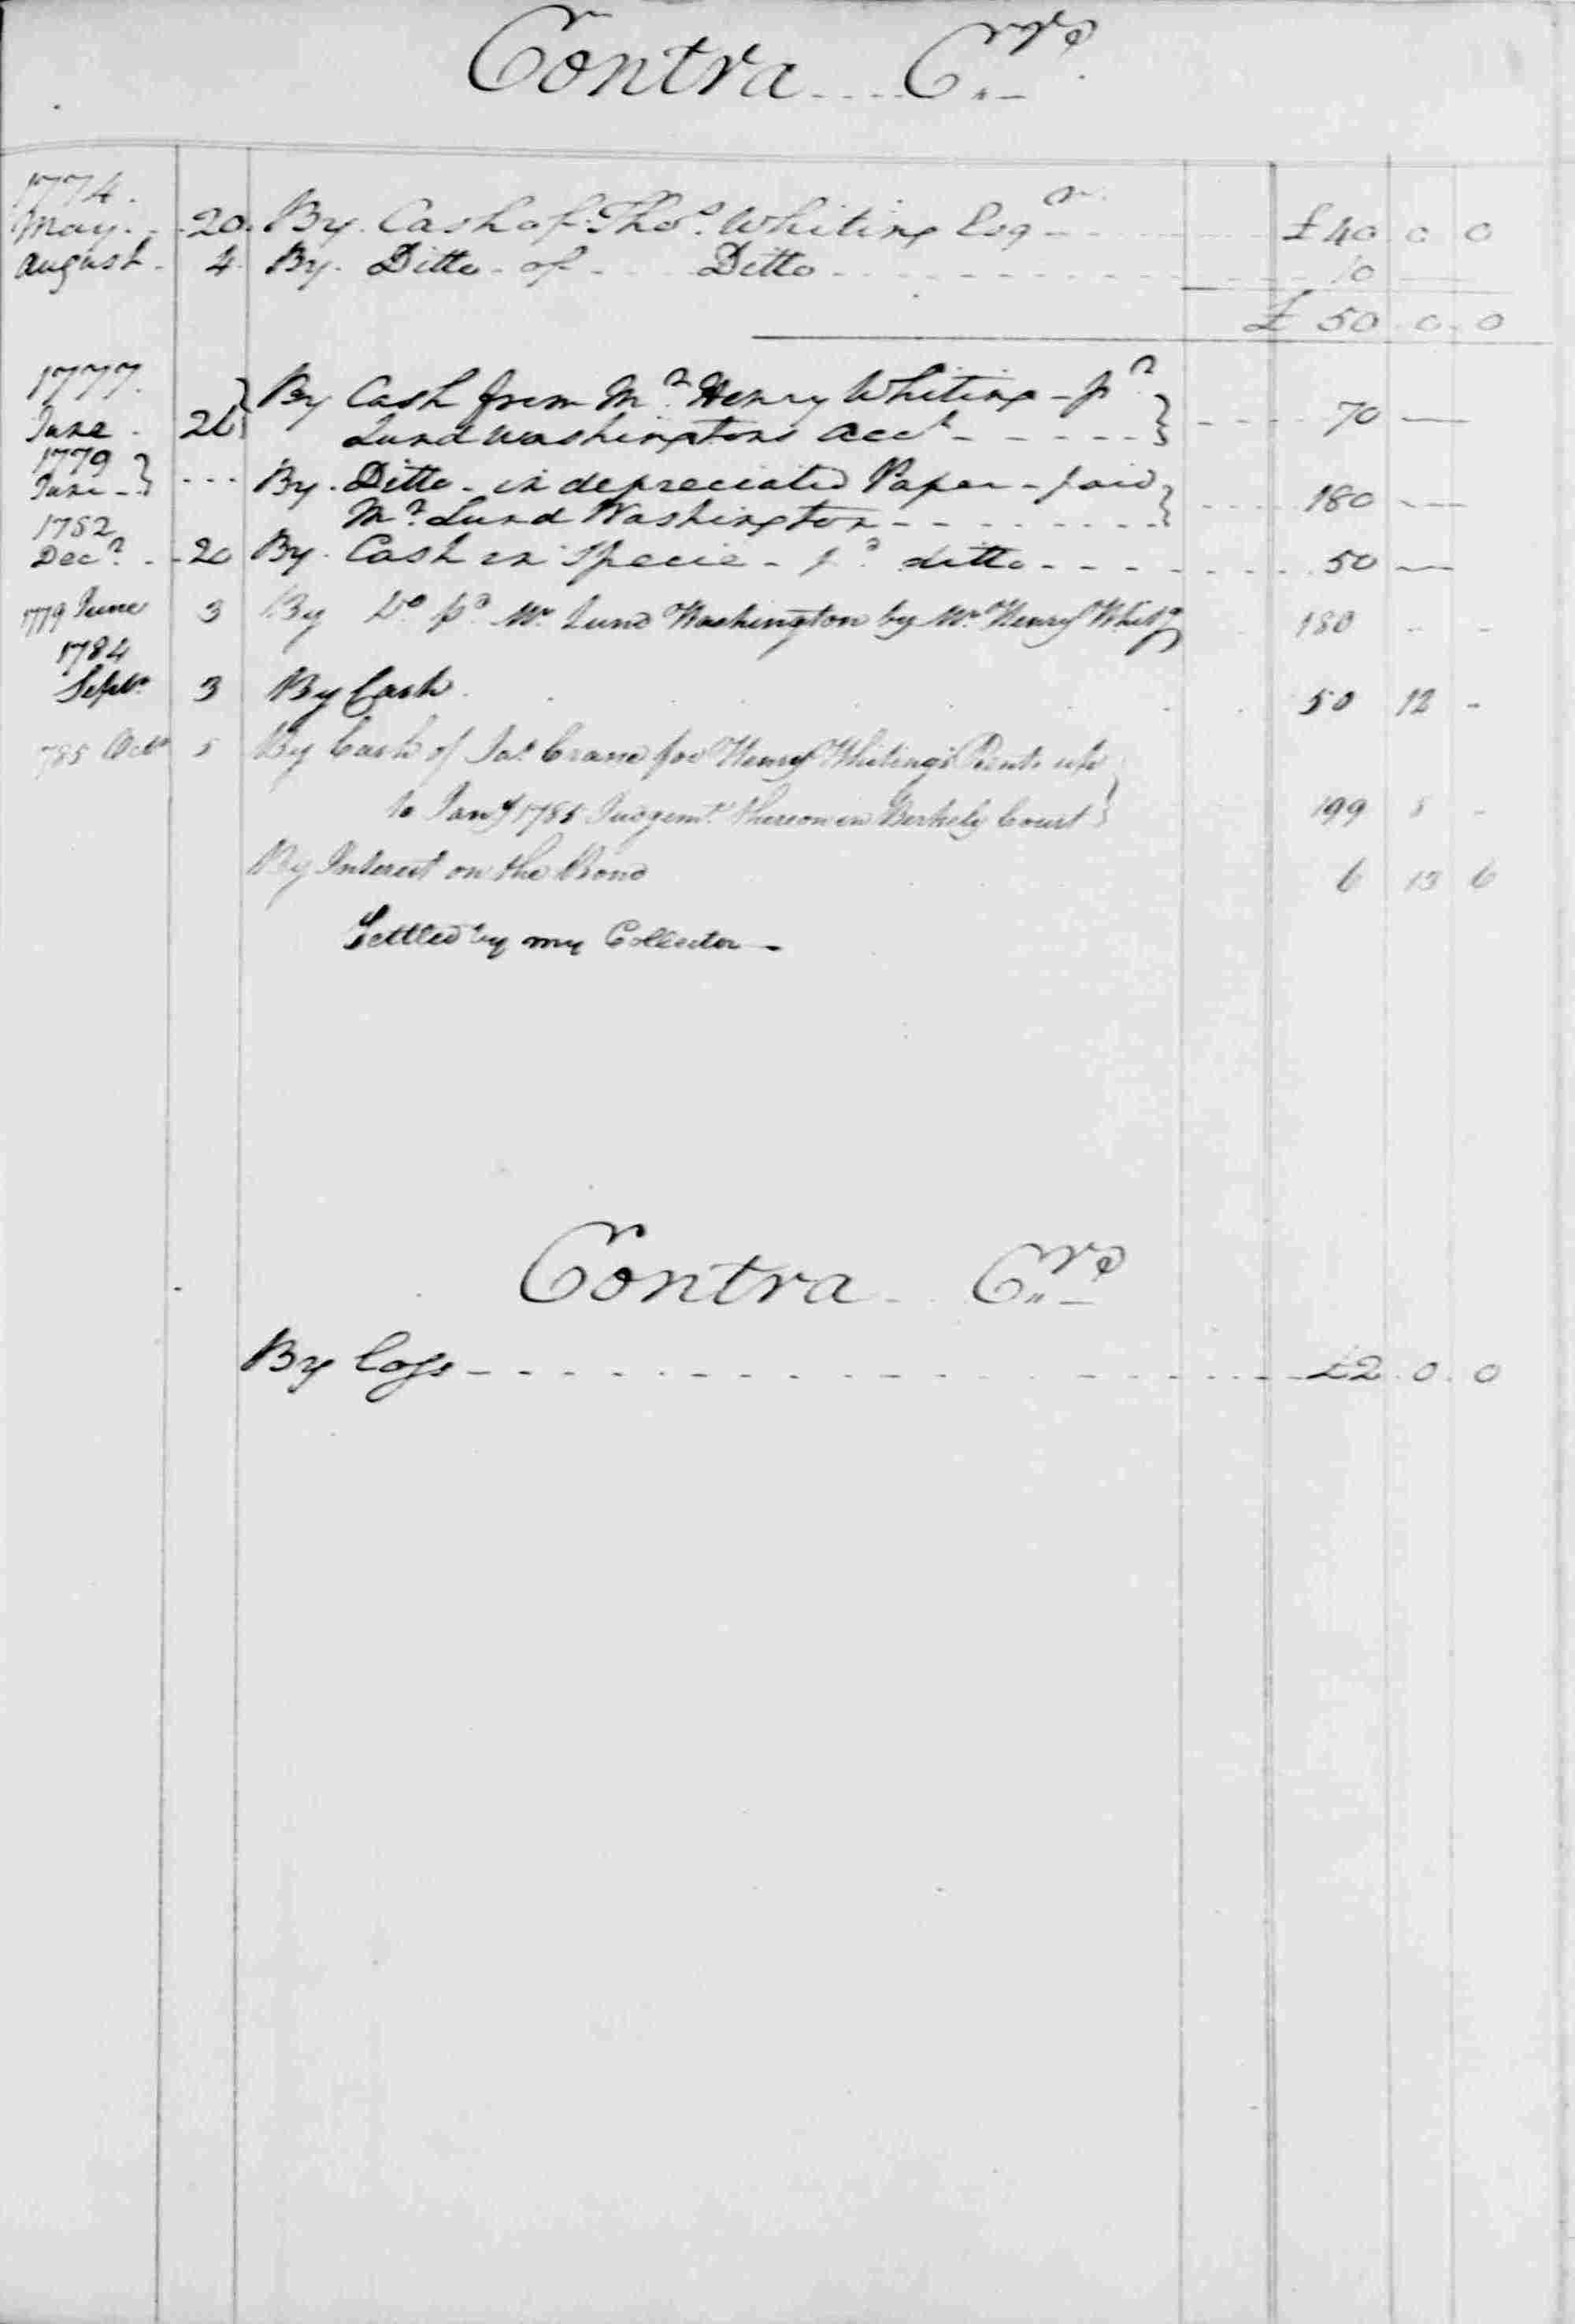 Ledger B, folio 113, right side